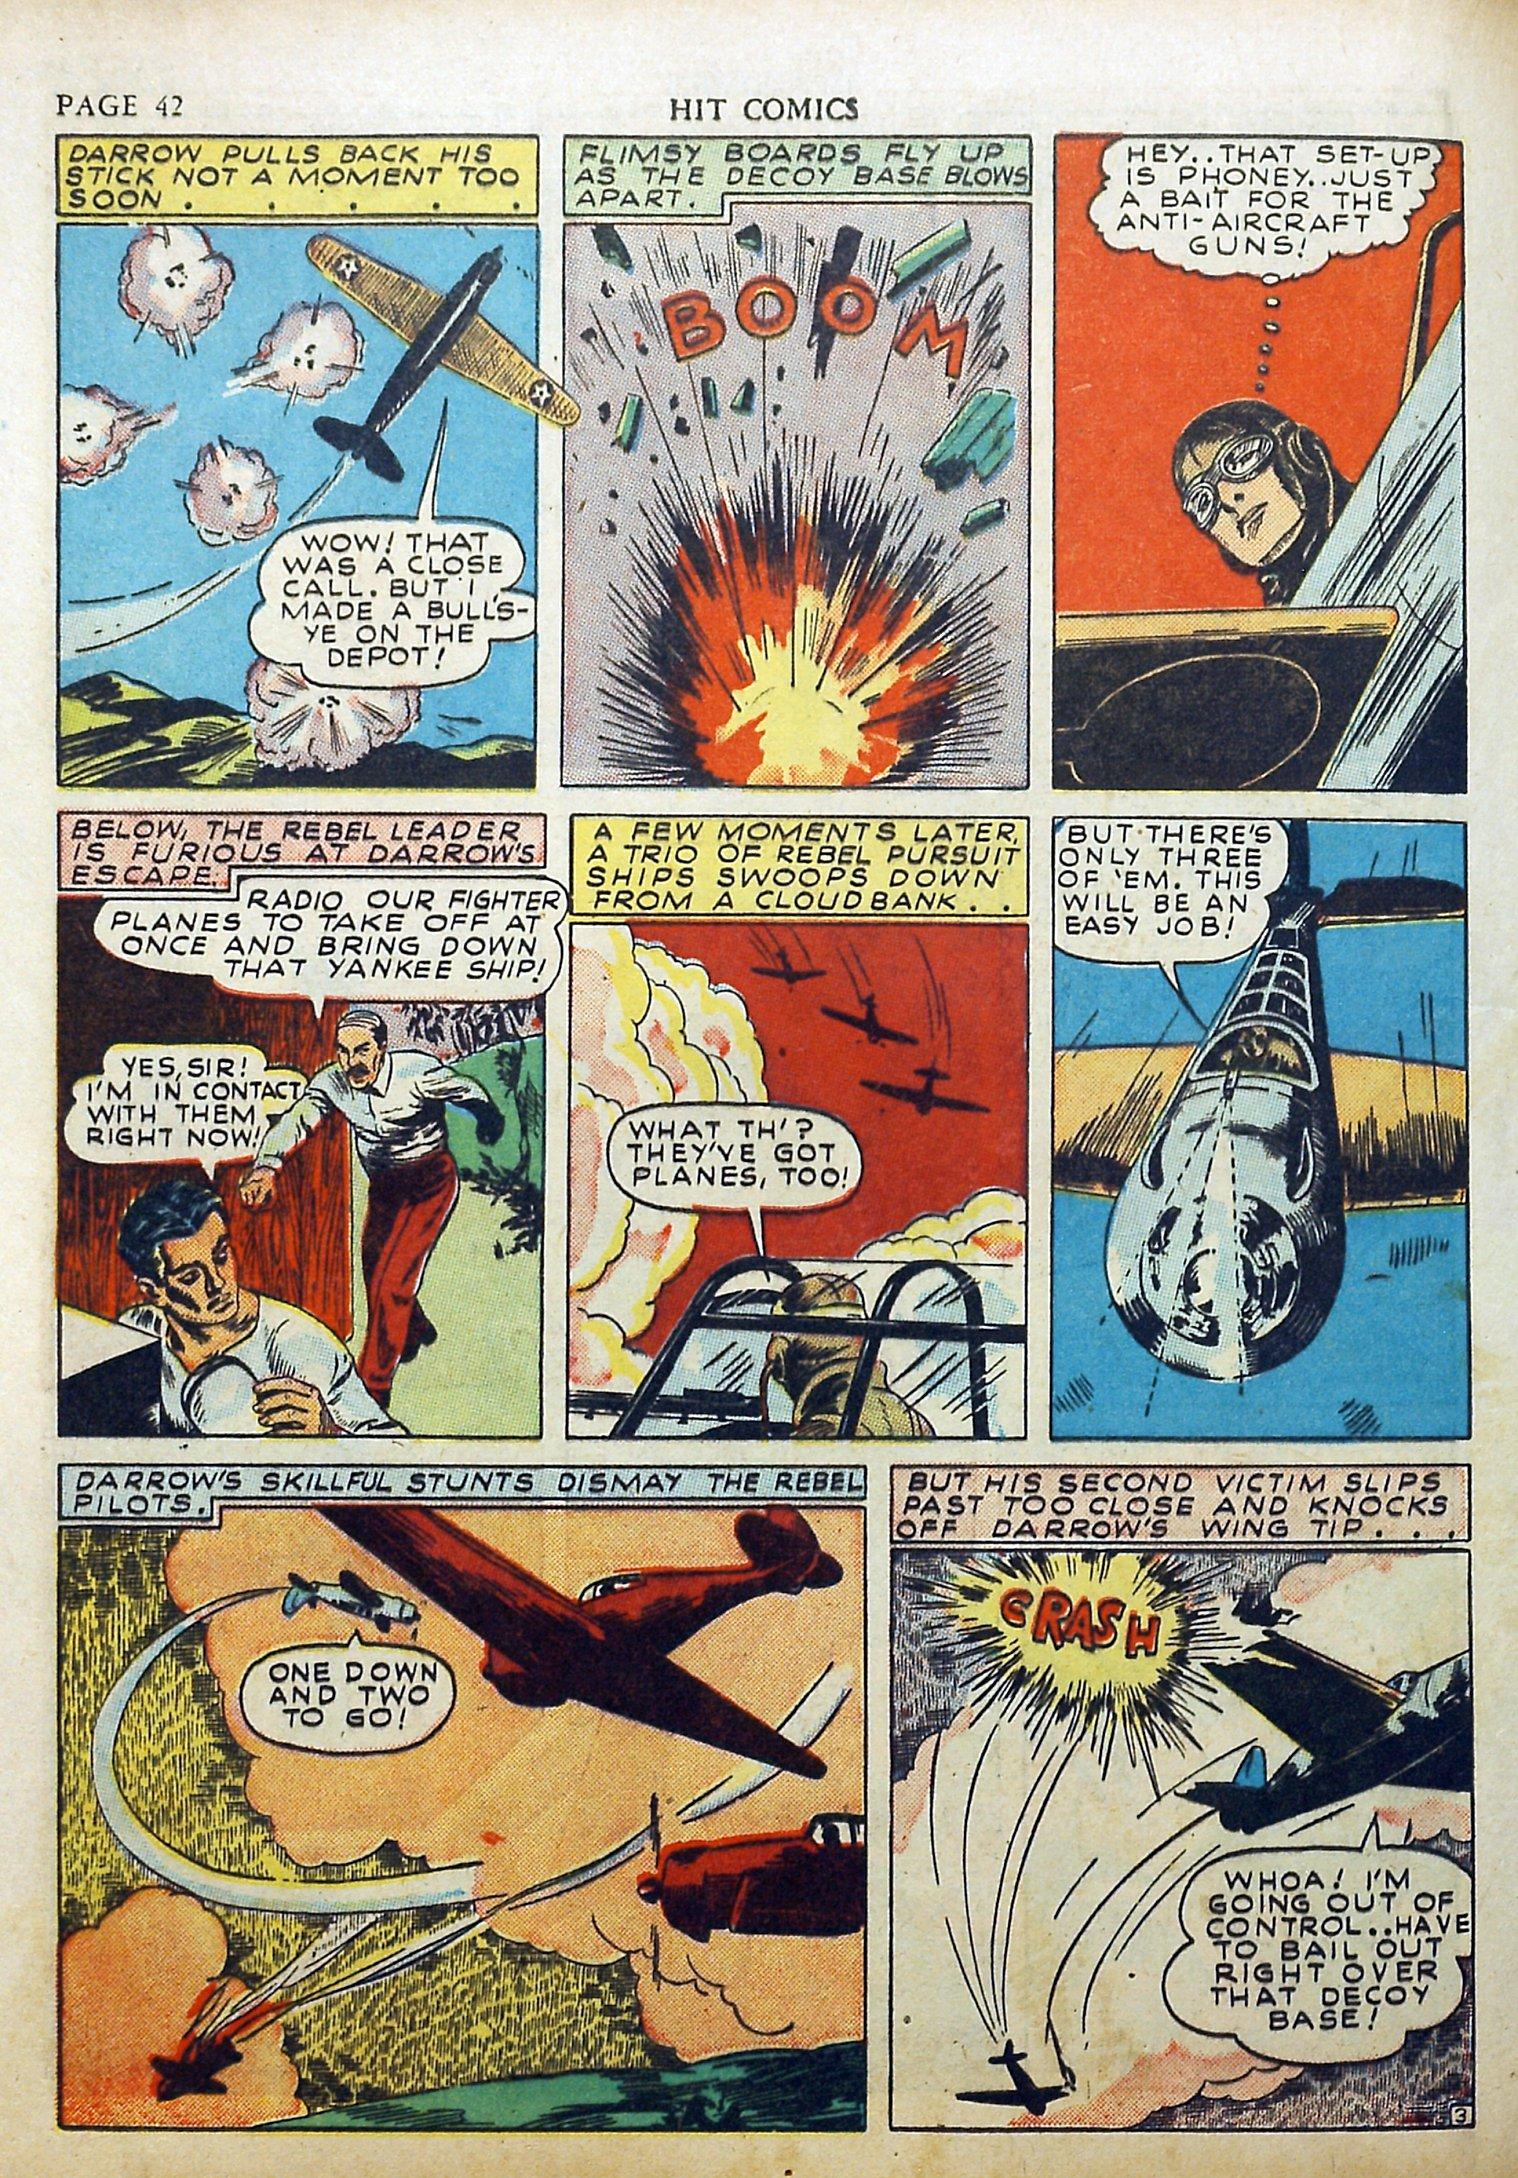 Read online Hit Comics comic -  Issue #17 - 44